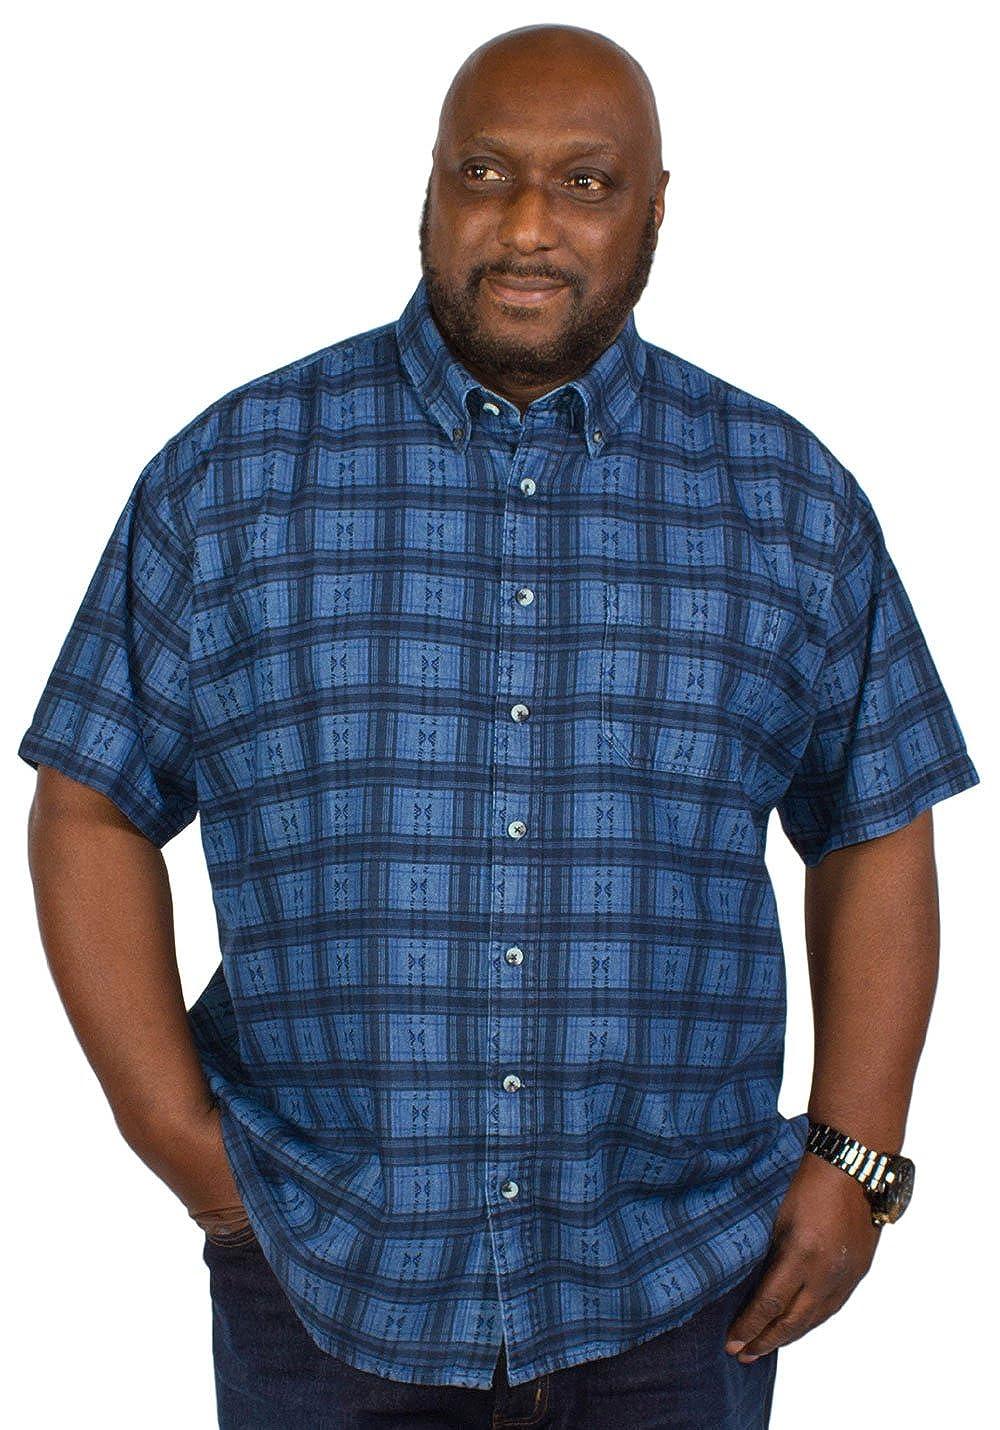 Espionage Big Mens Printed Denim Shirt 2xl Amazon Co Uk Clothing